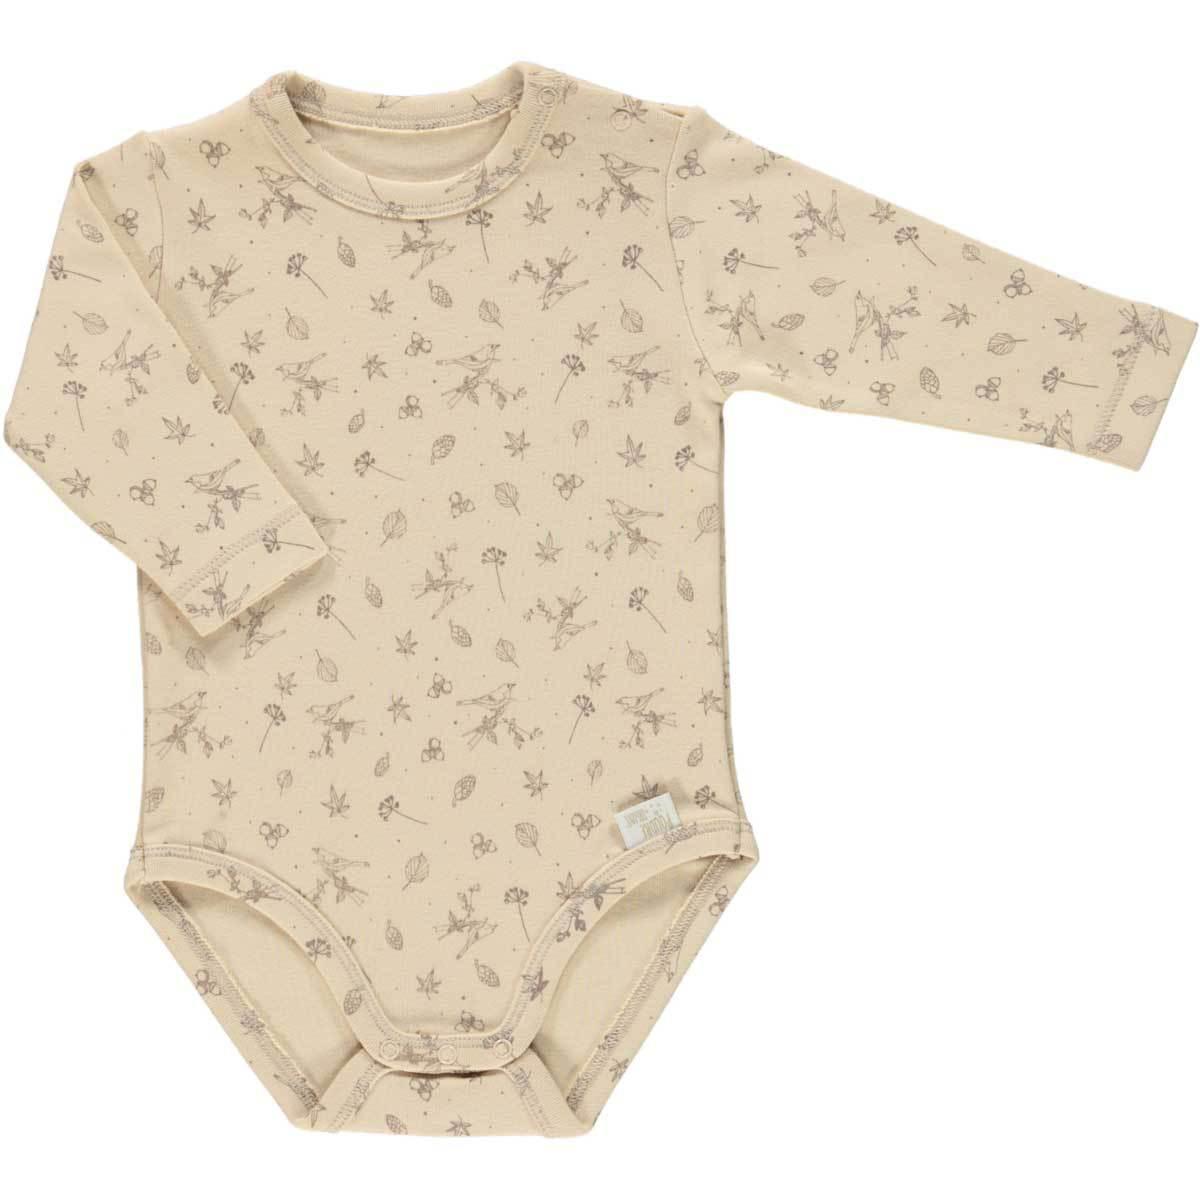 Body et Pyjama Body Col Rond Salto Amberlight - 9 mois Body Col Rond Salto Amberlight - 9 mois